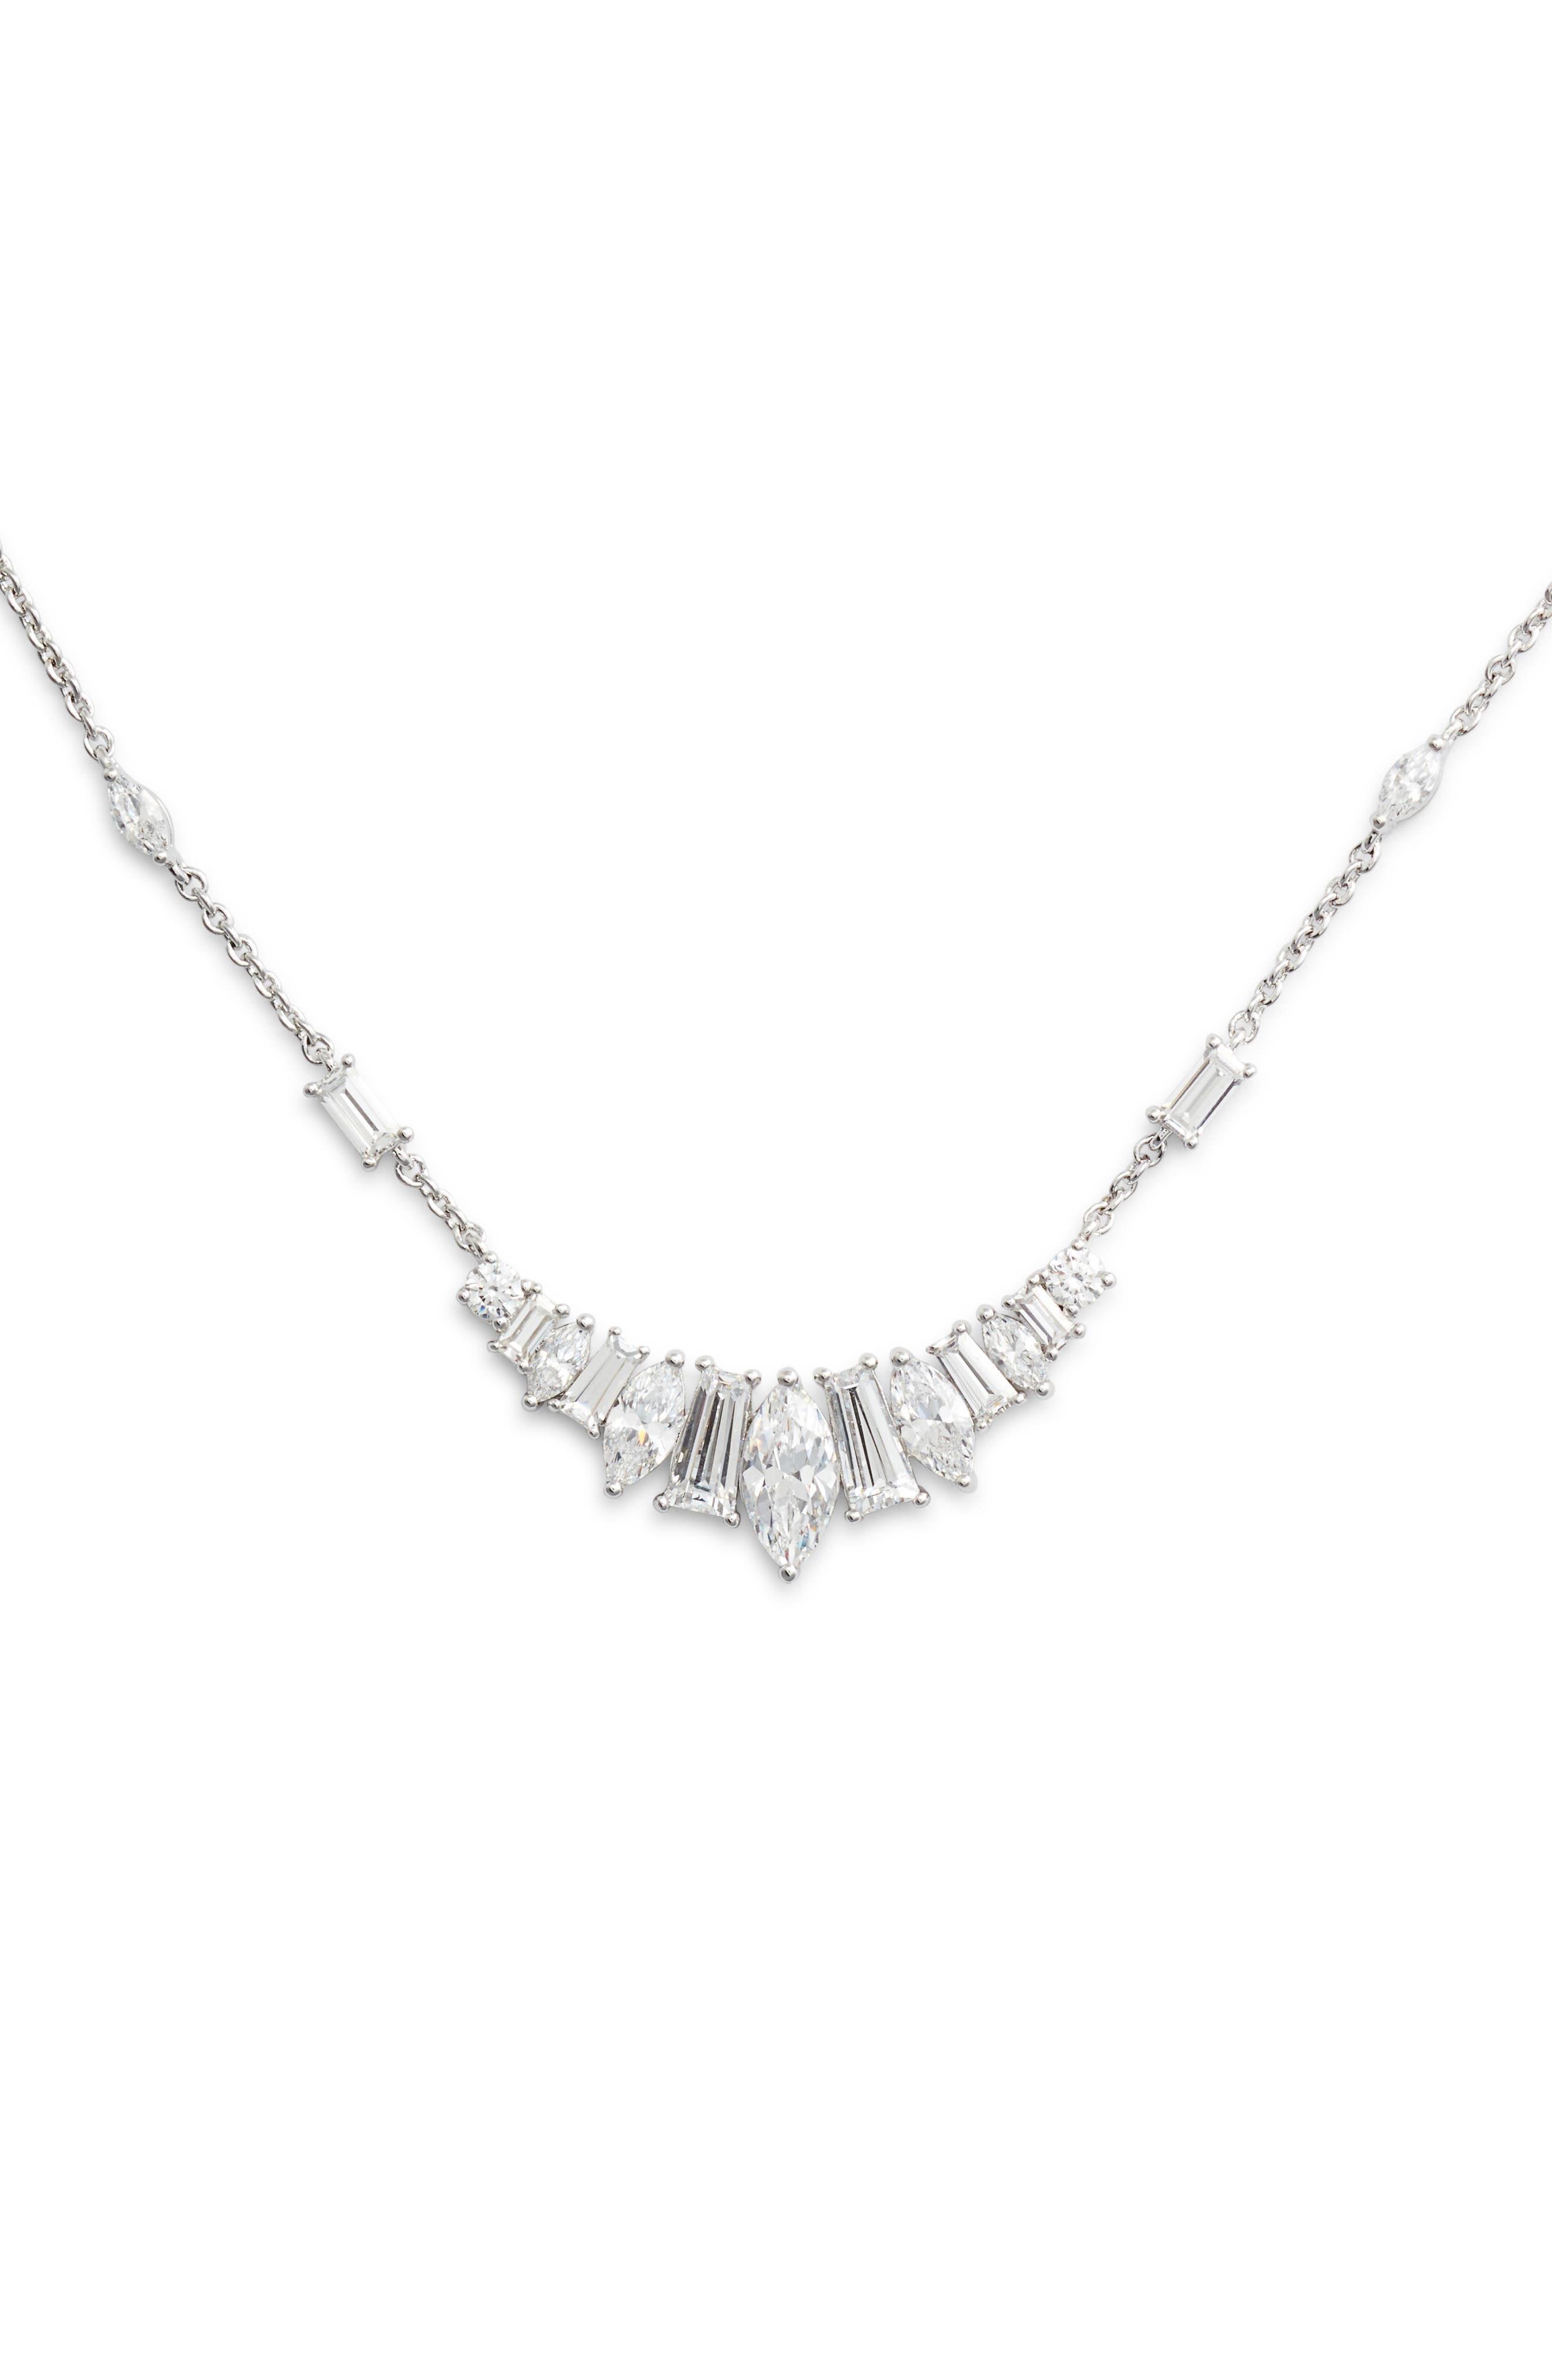 Fanfare Frontal Necklace,                         Main,                         color, Silver